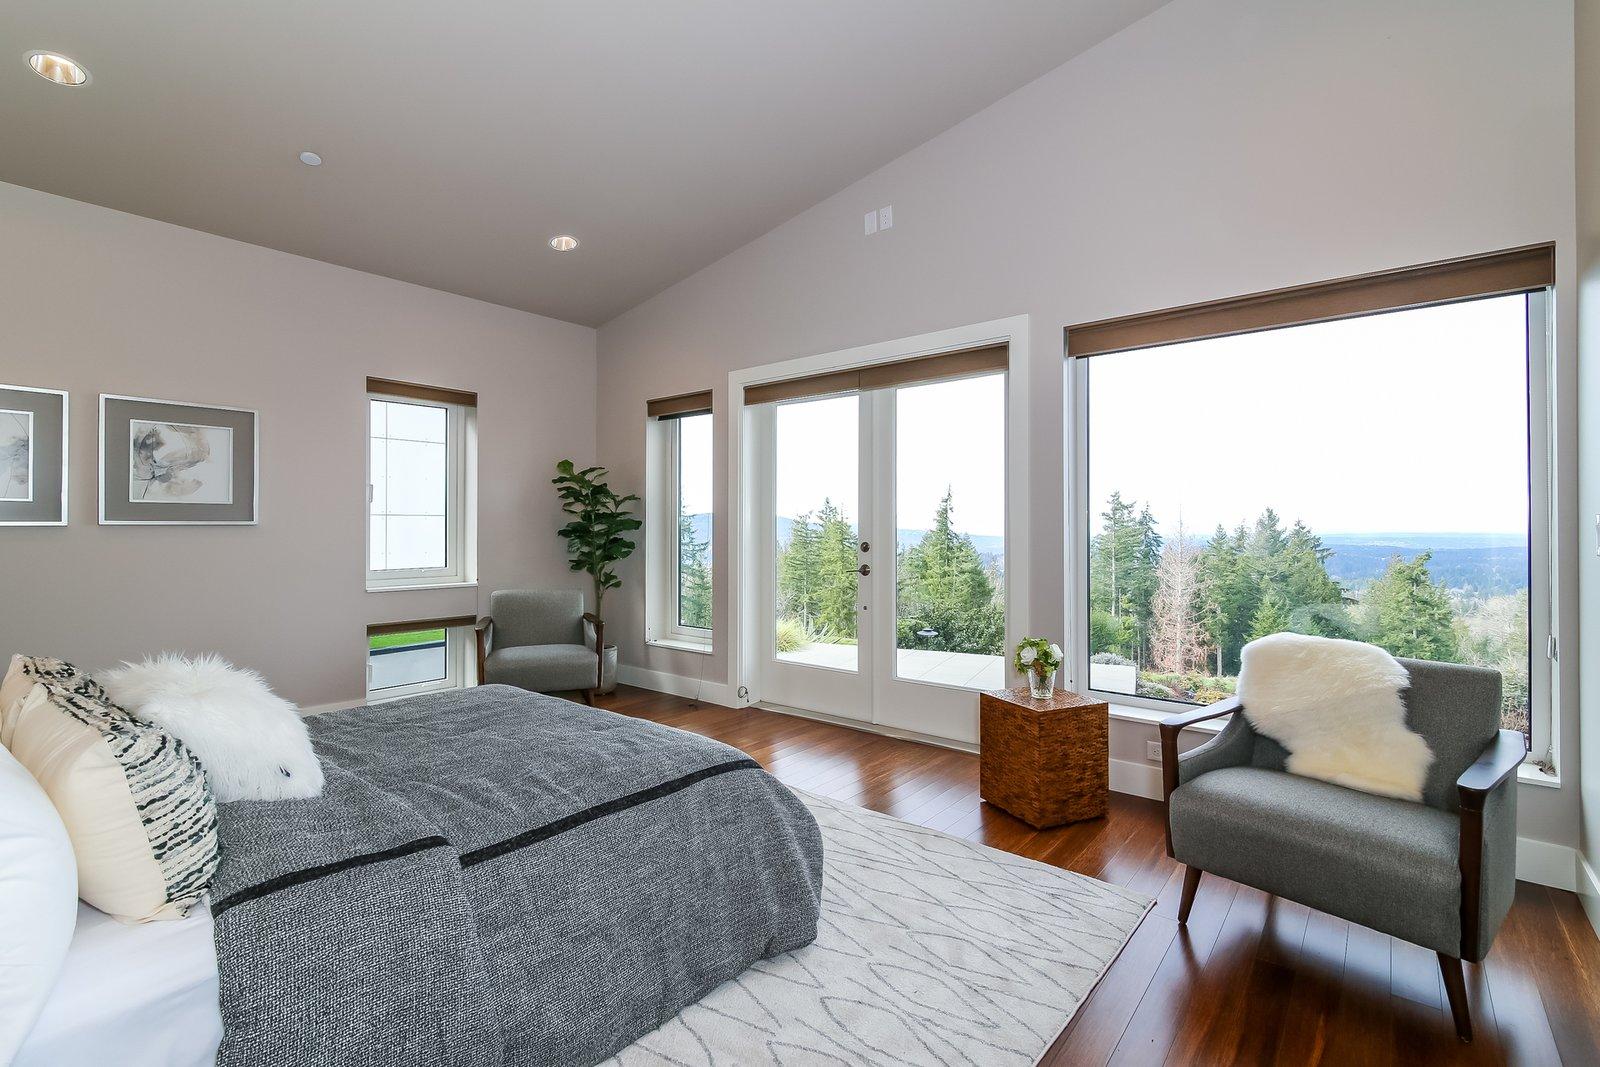 Bedroom, Chair, Ceiling Lighting, Bed, and Medium Hardwood Floor  Japanese Builder Ichijo Creates Net-Zero Energy Home by PlanOmatic